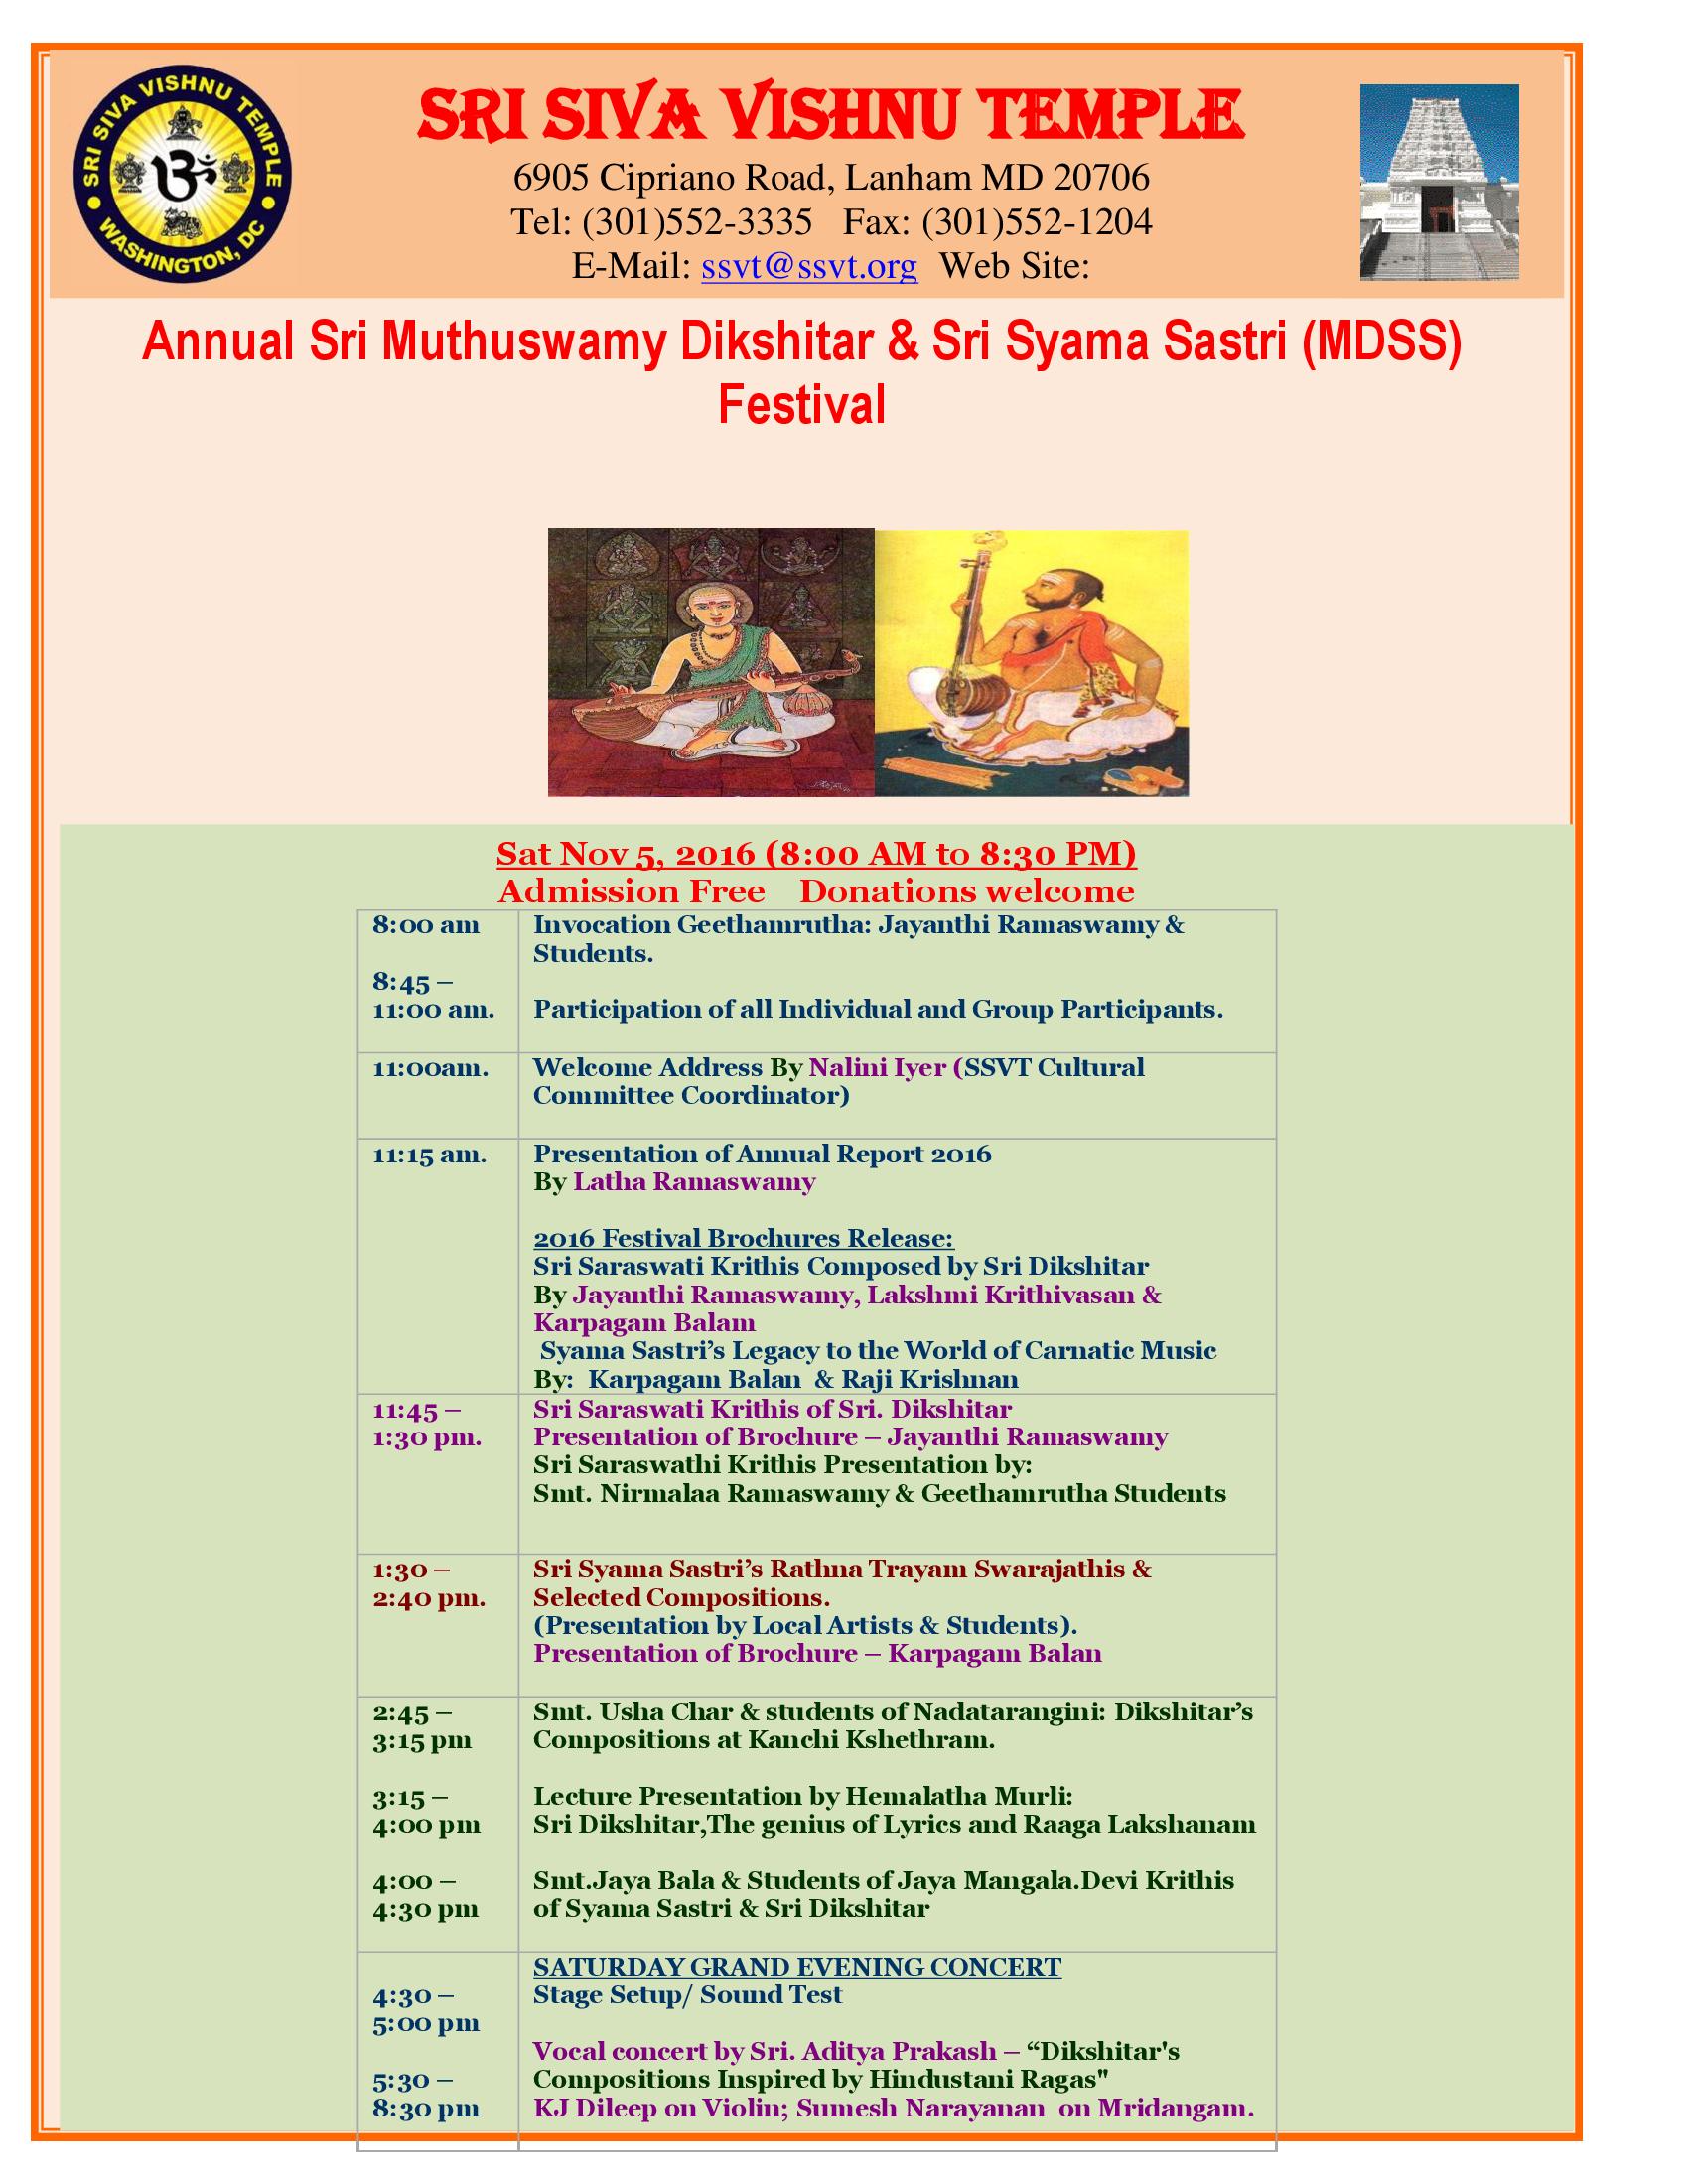 dikshitar-syamasastri-mdss-festival-flyer-lanham-md-nov2016